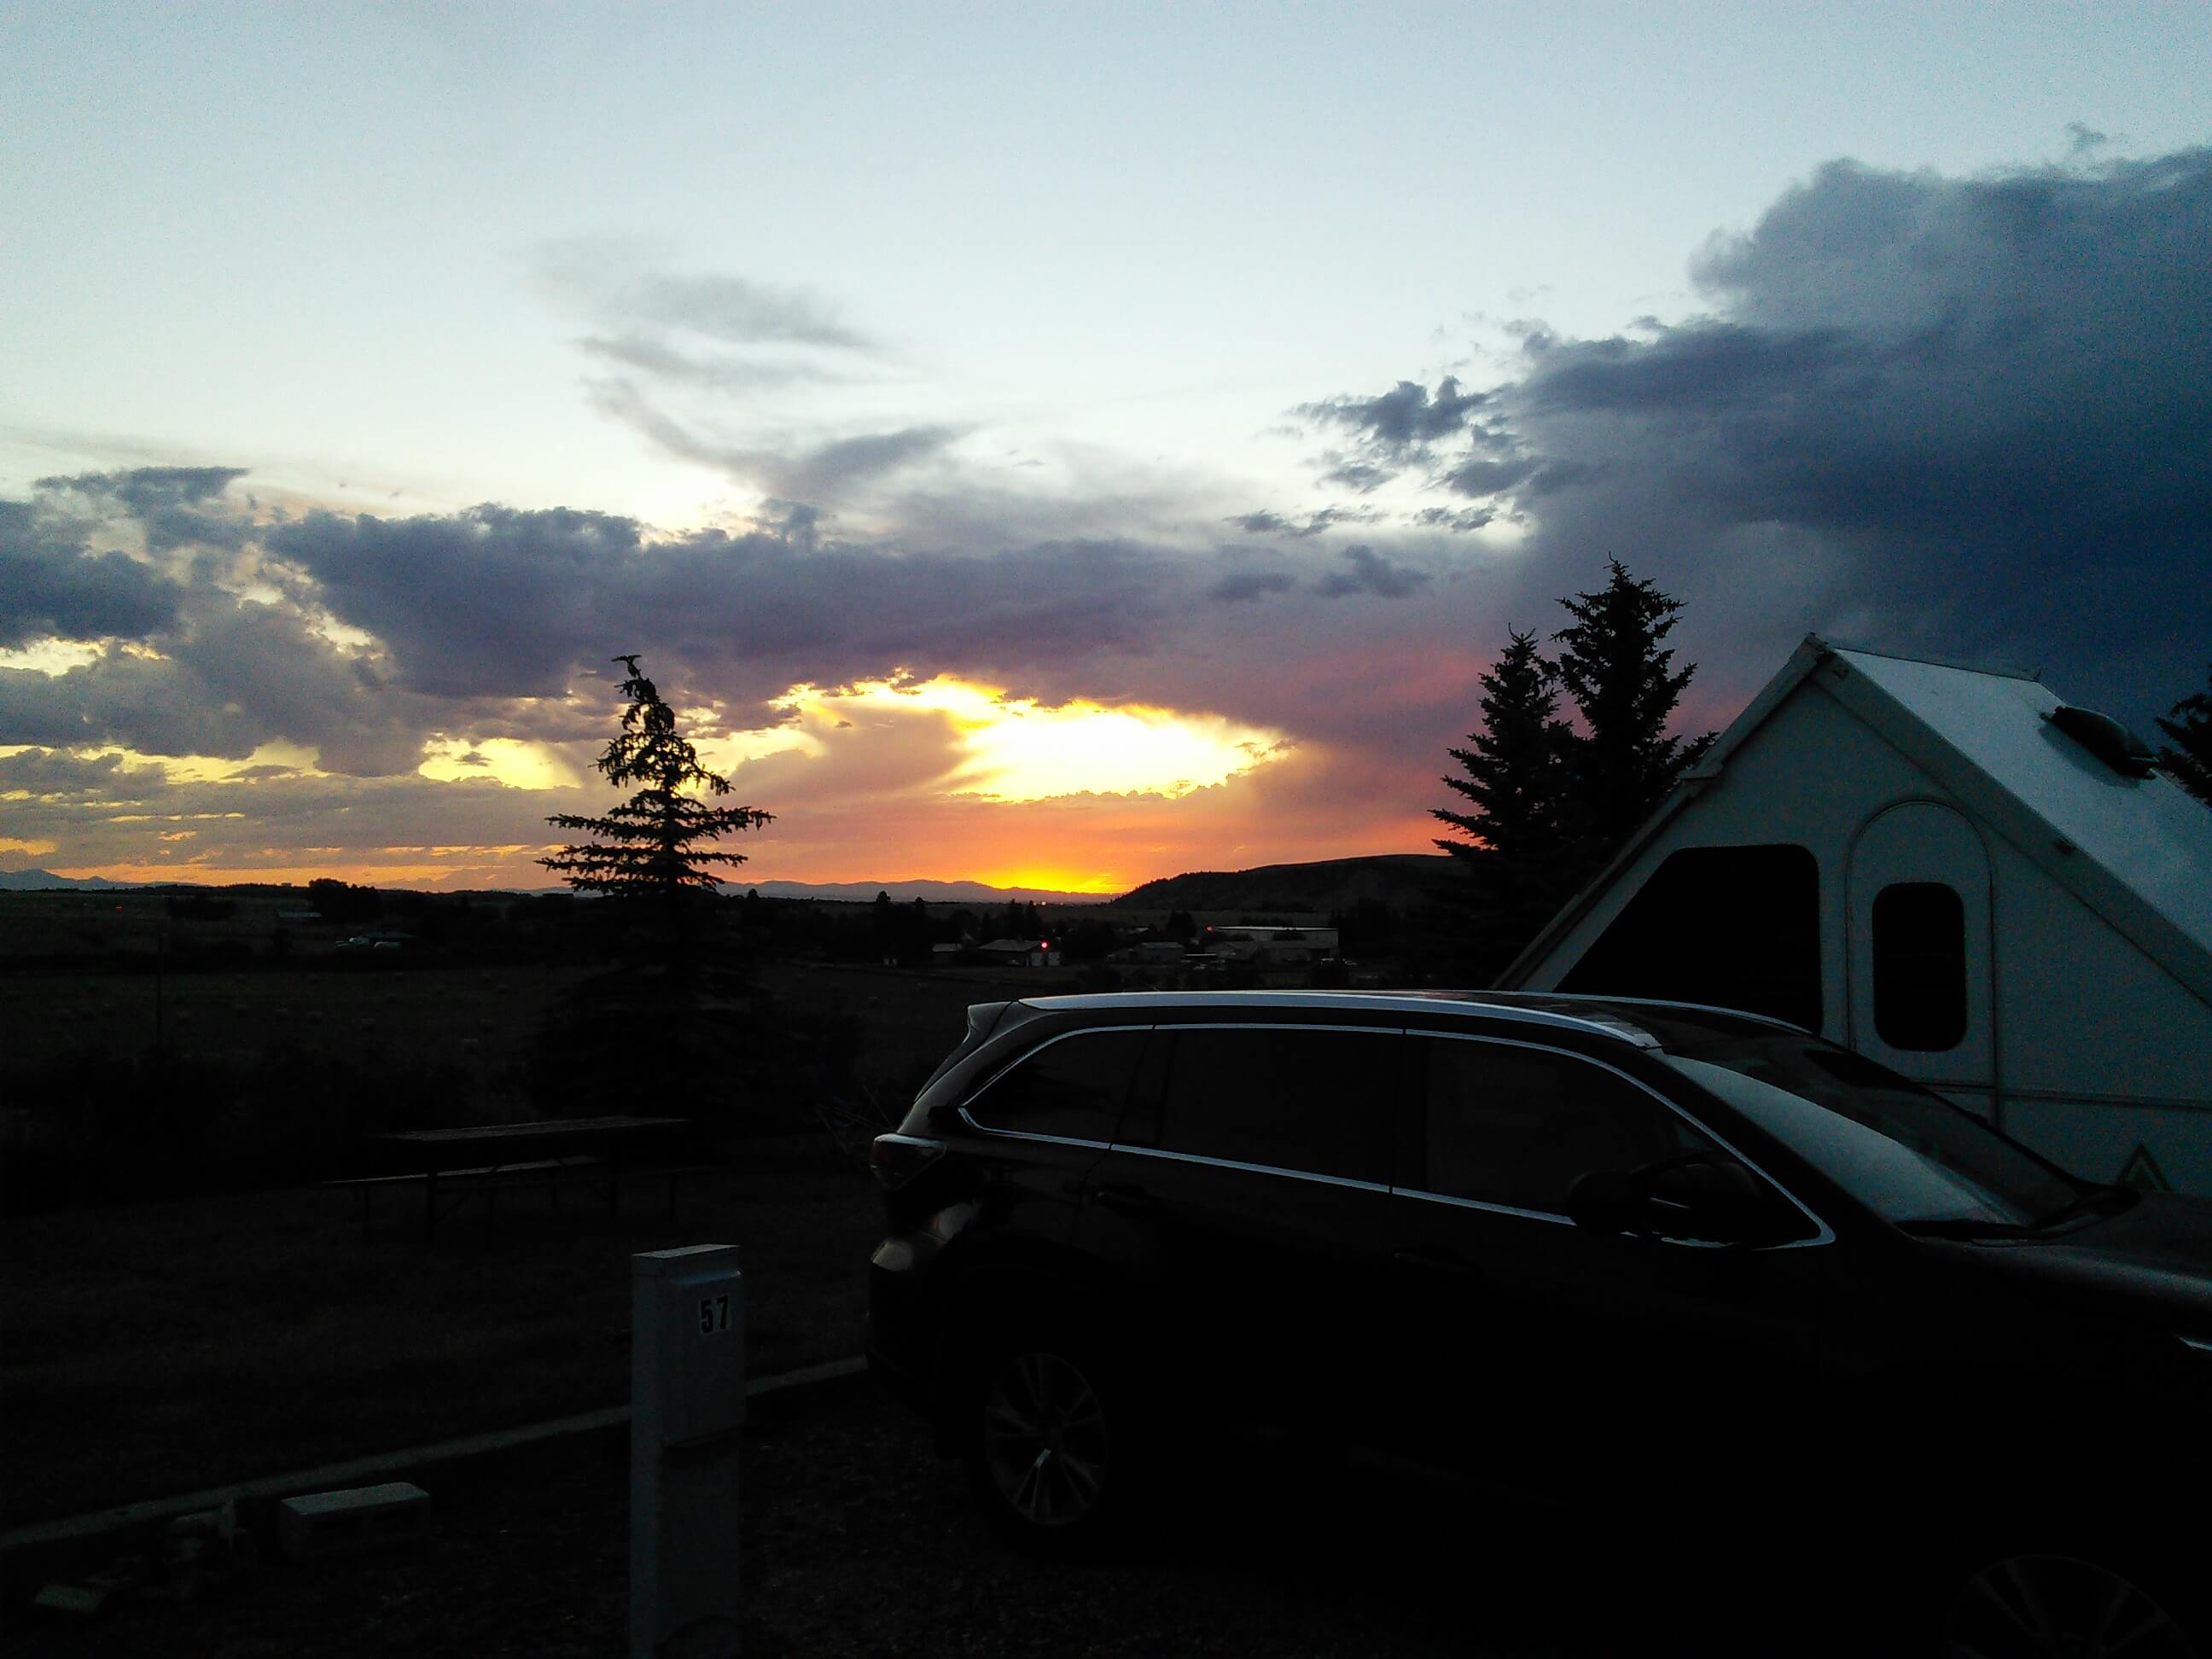 Sunset in Bozeman